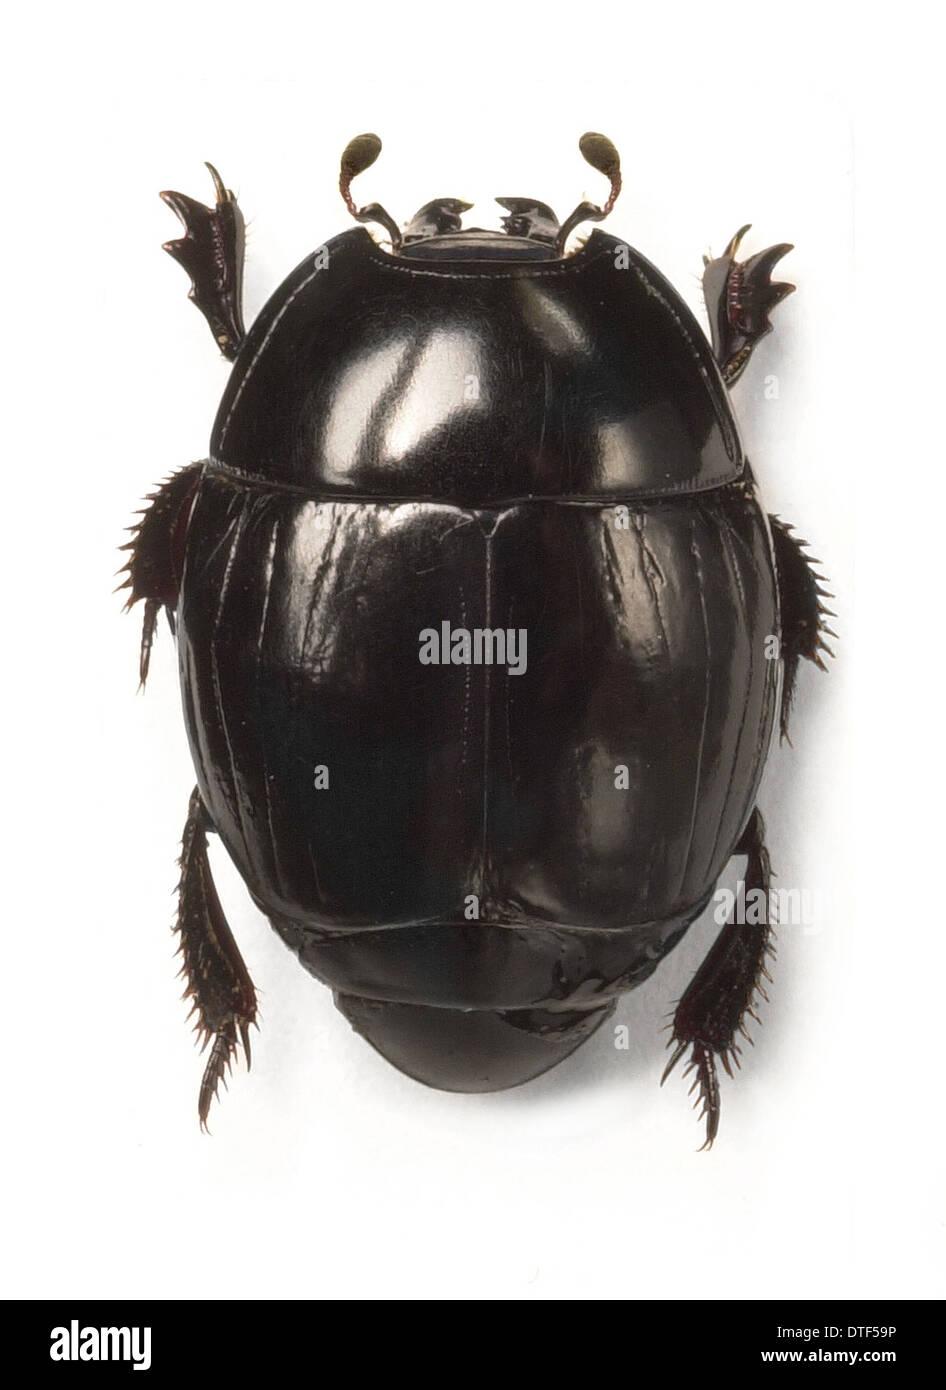 Clown beetle - Stock Image